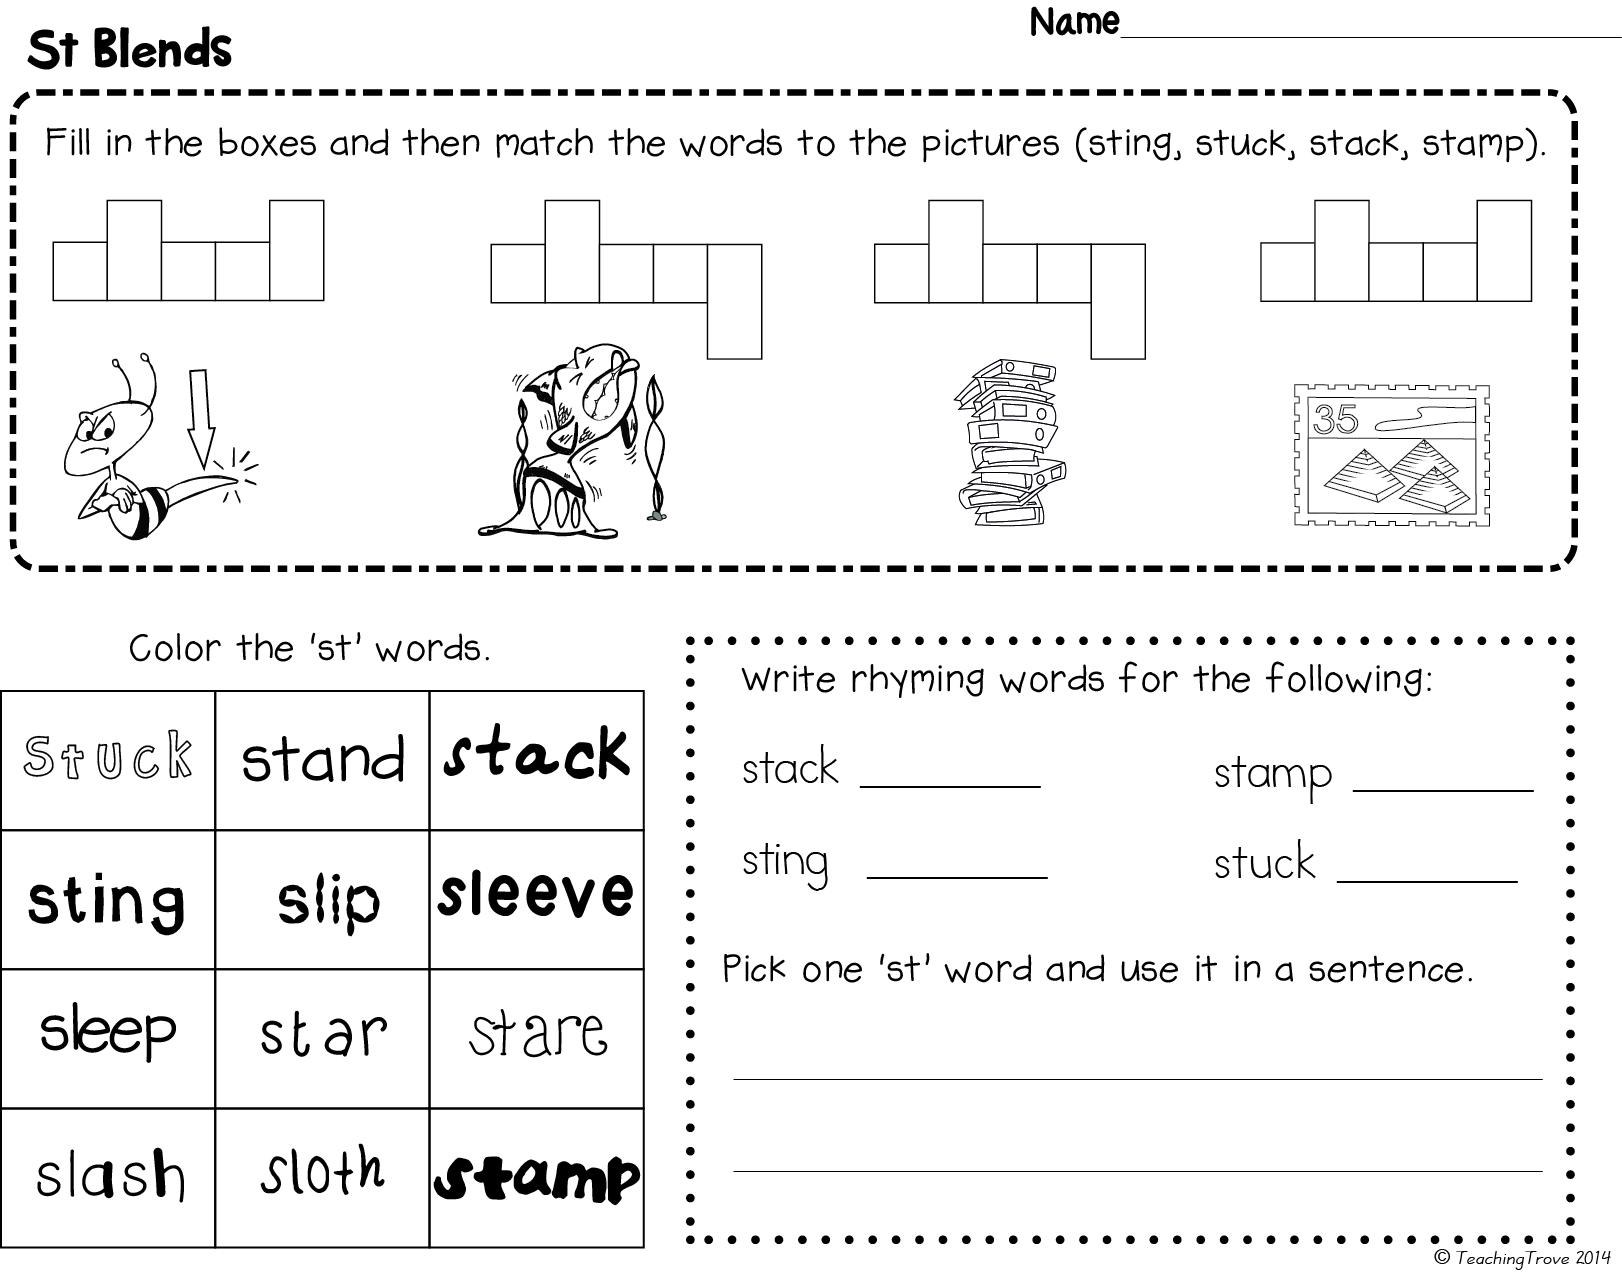 Blends Worksheets For S L And R Blends